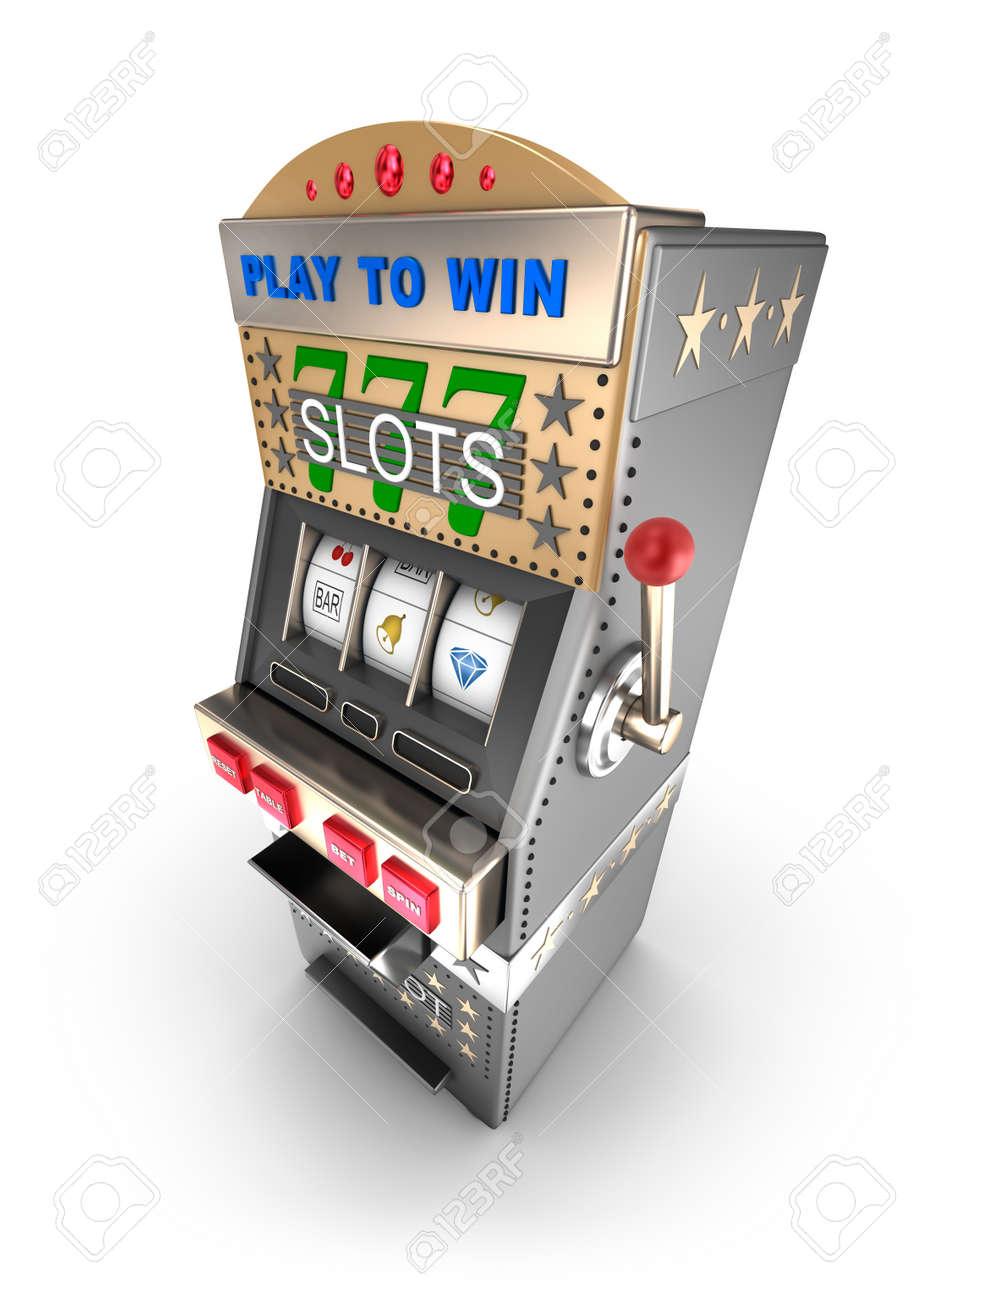 Gamble machine gamble rogers middle school staff